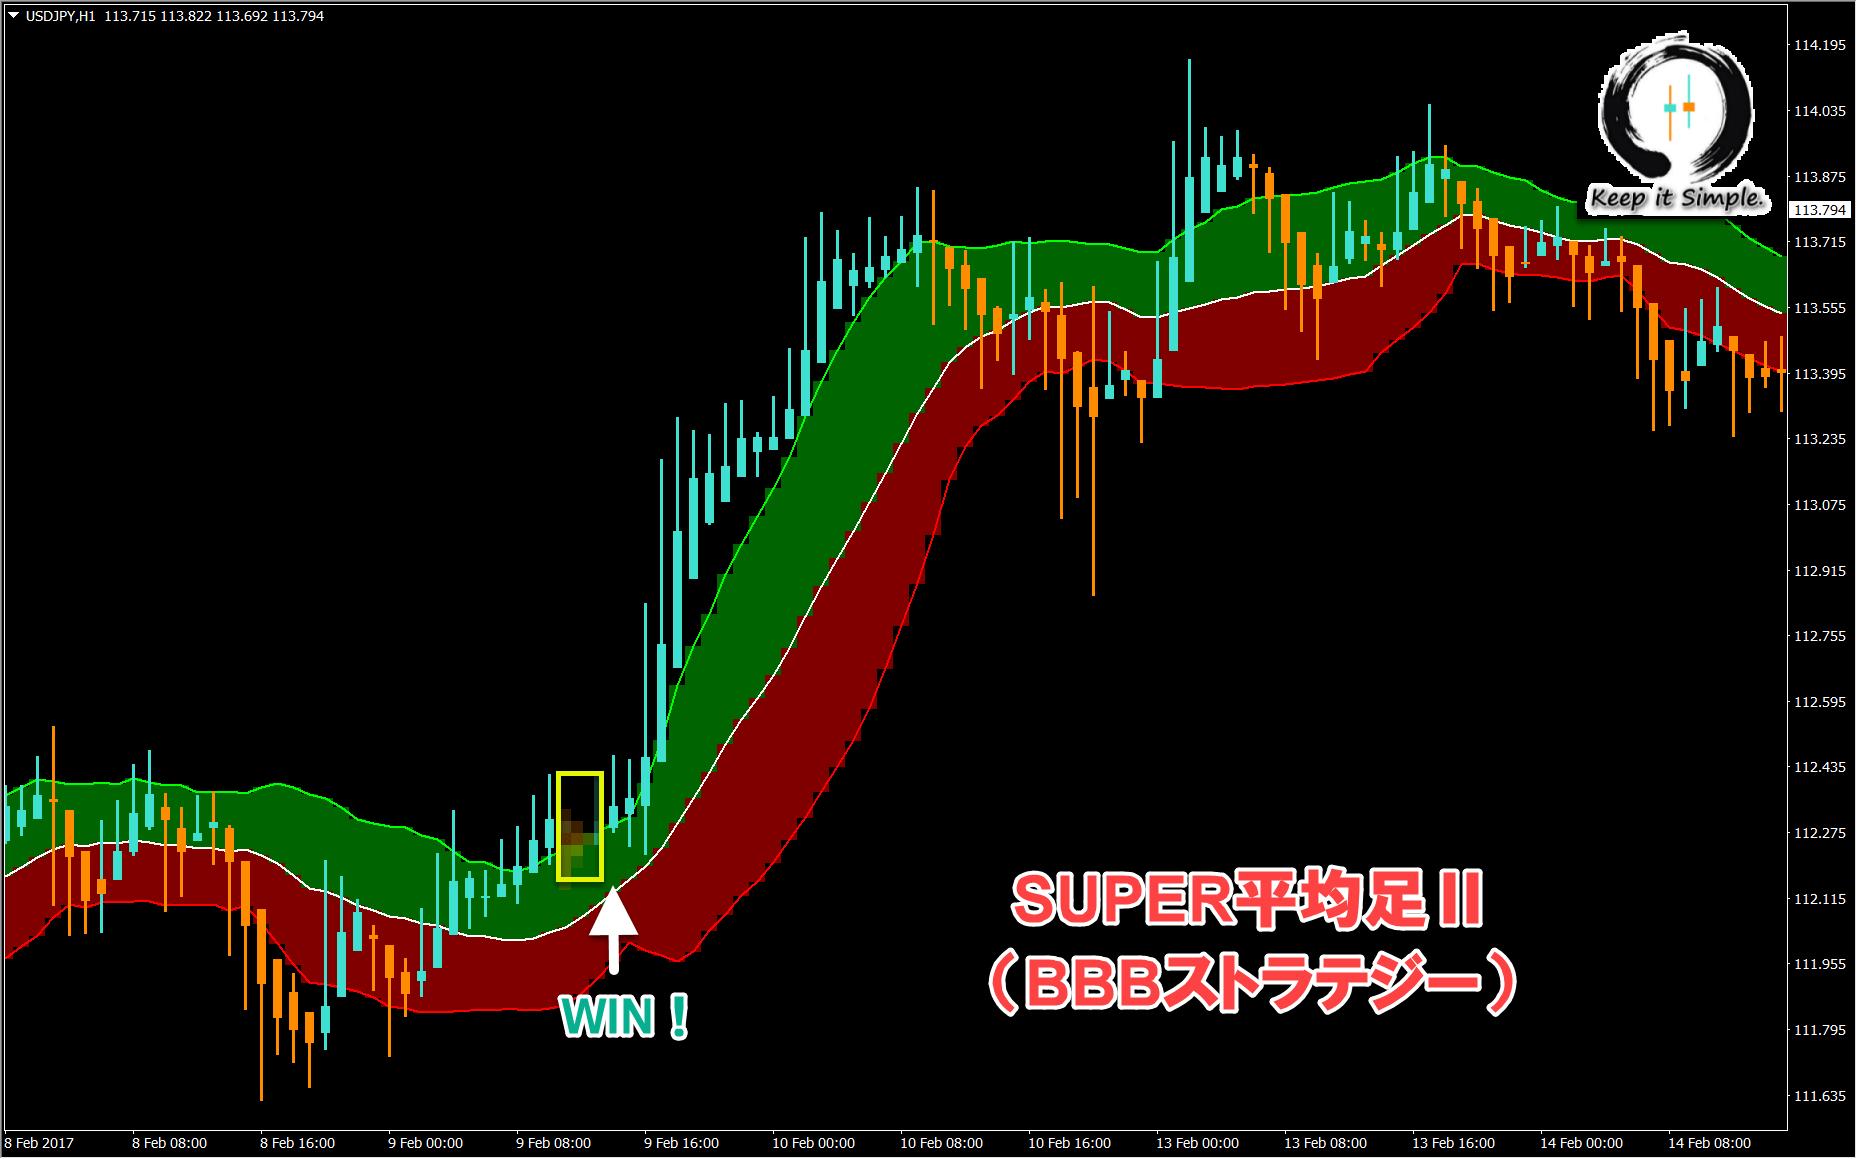 SUPER平均足2_BBBストラテジー_くまひげ先生のトレード戦略